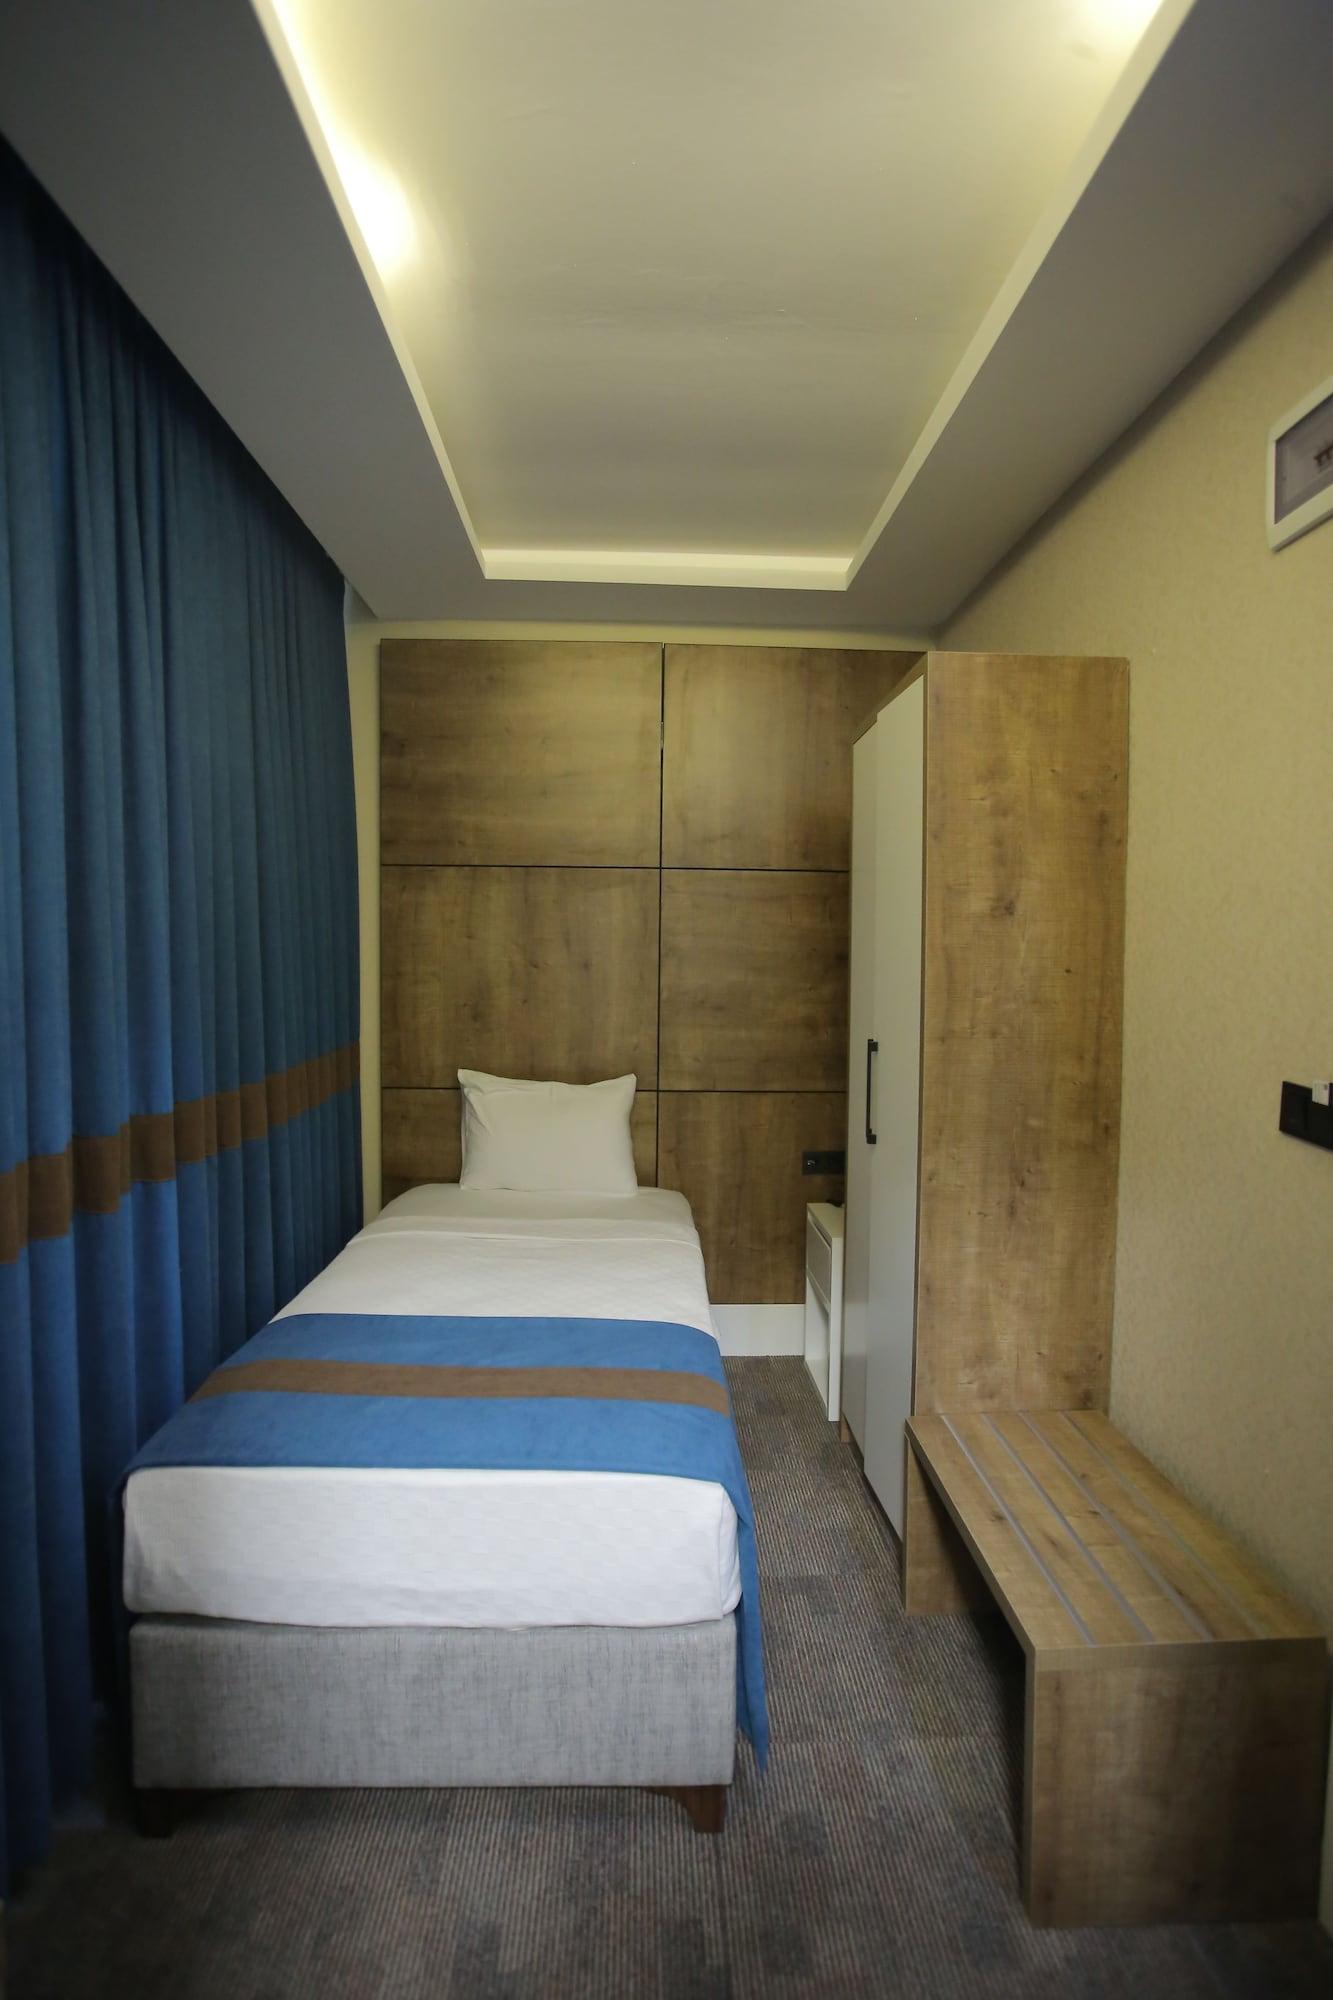 Artuklu Otel, Kızıltepe